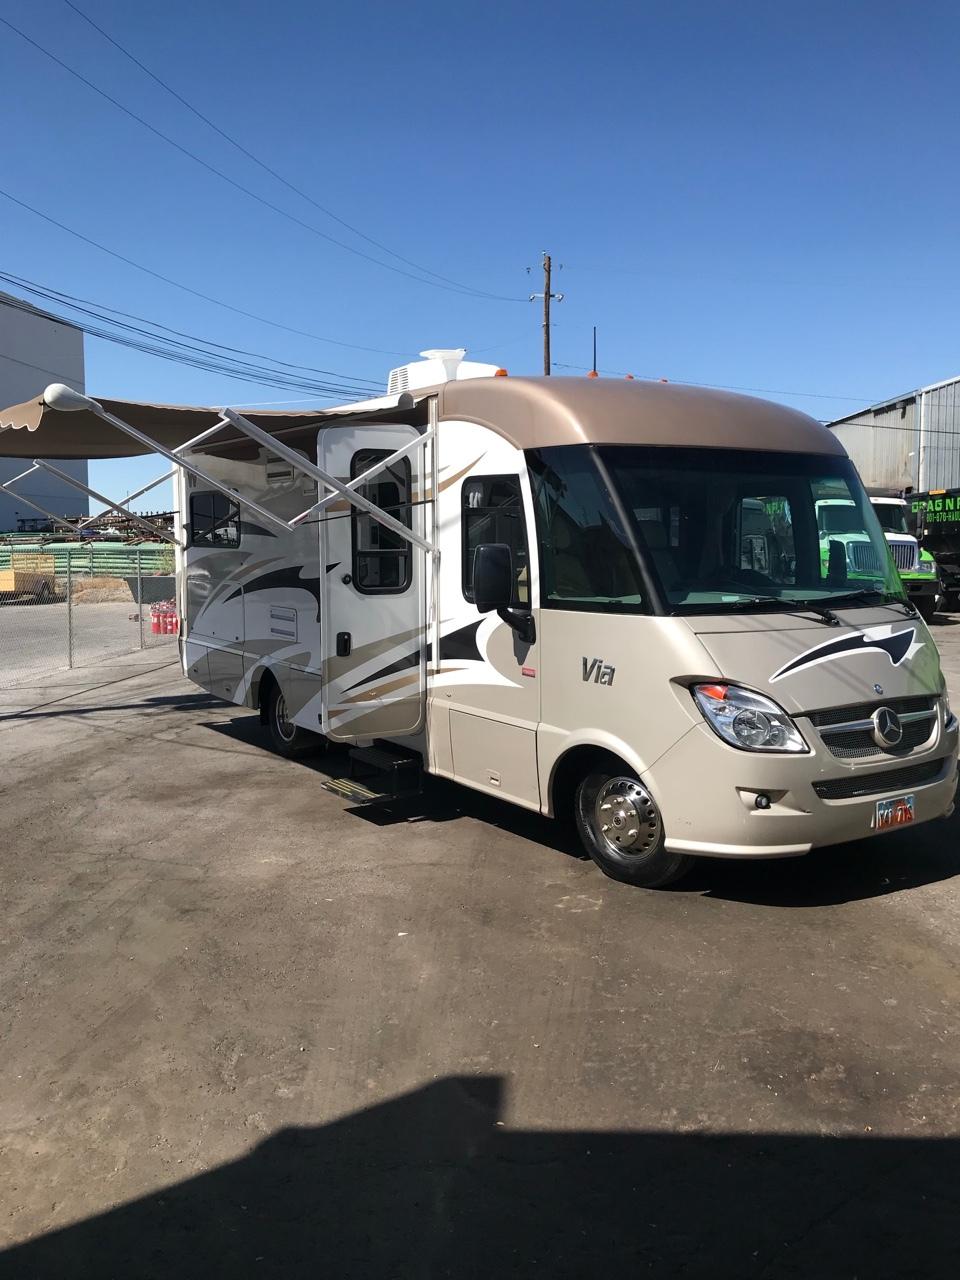 Utah - class a Motorhomes For Sale - RV Trader